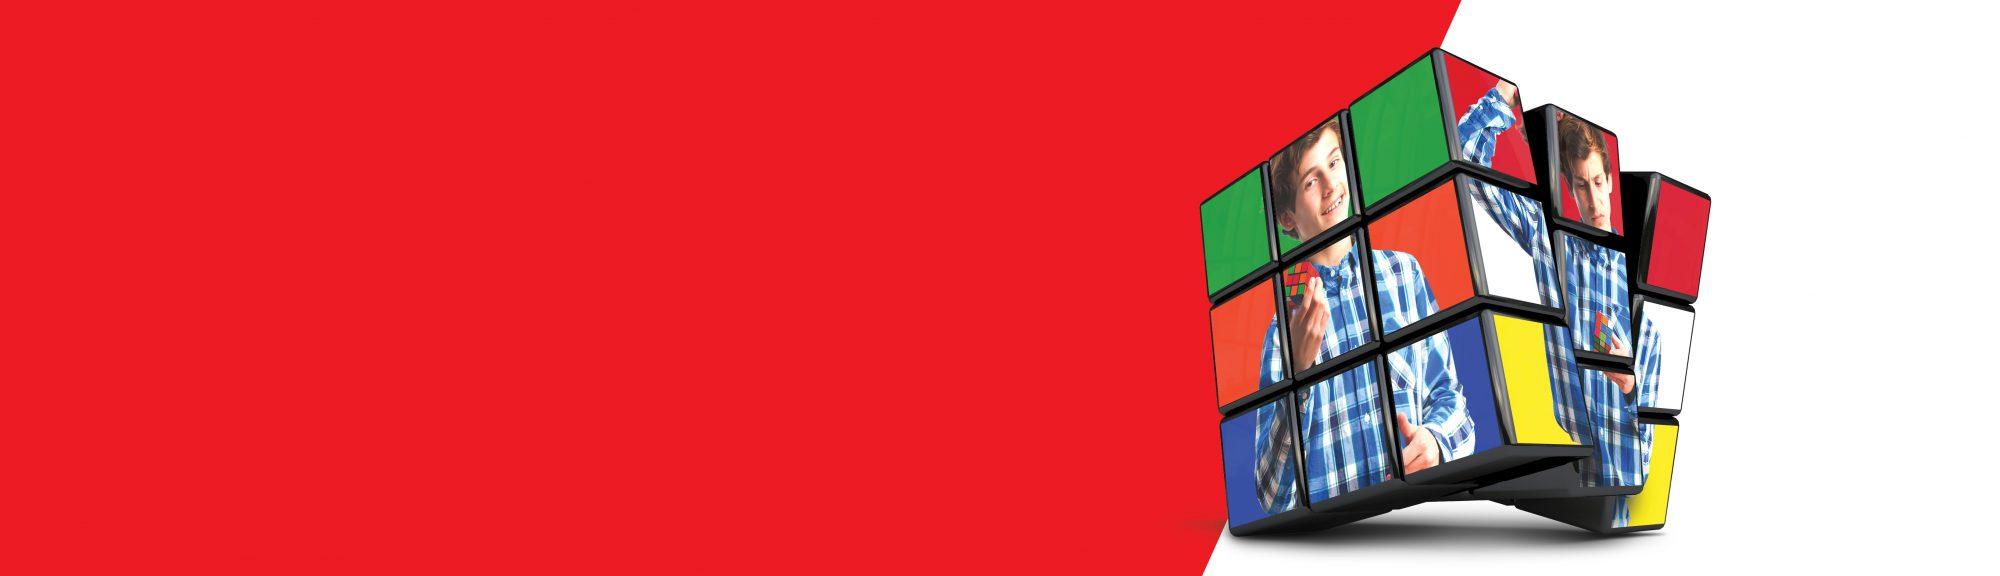 Beyond Rubik's Cube Featured Exhibit